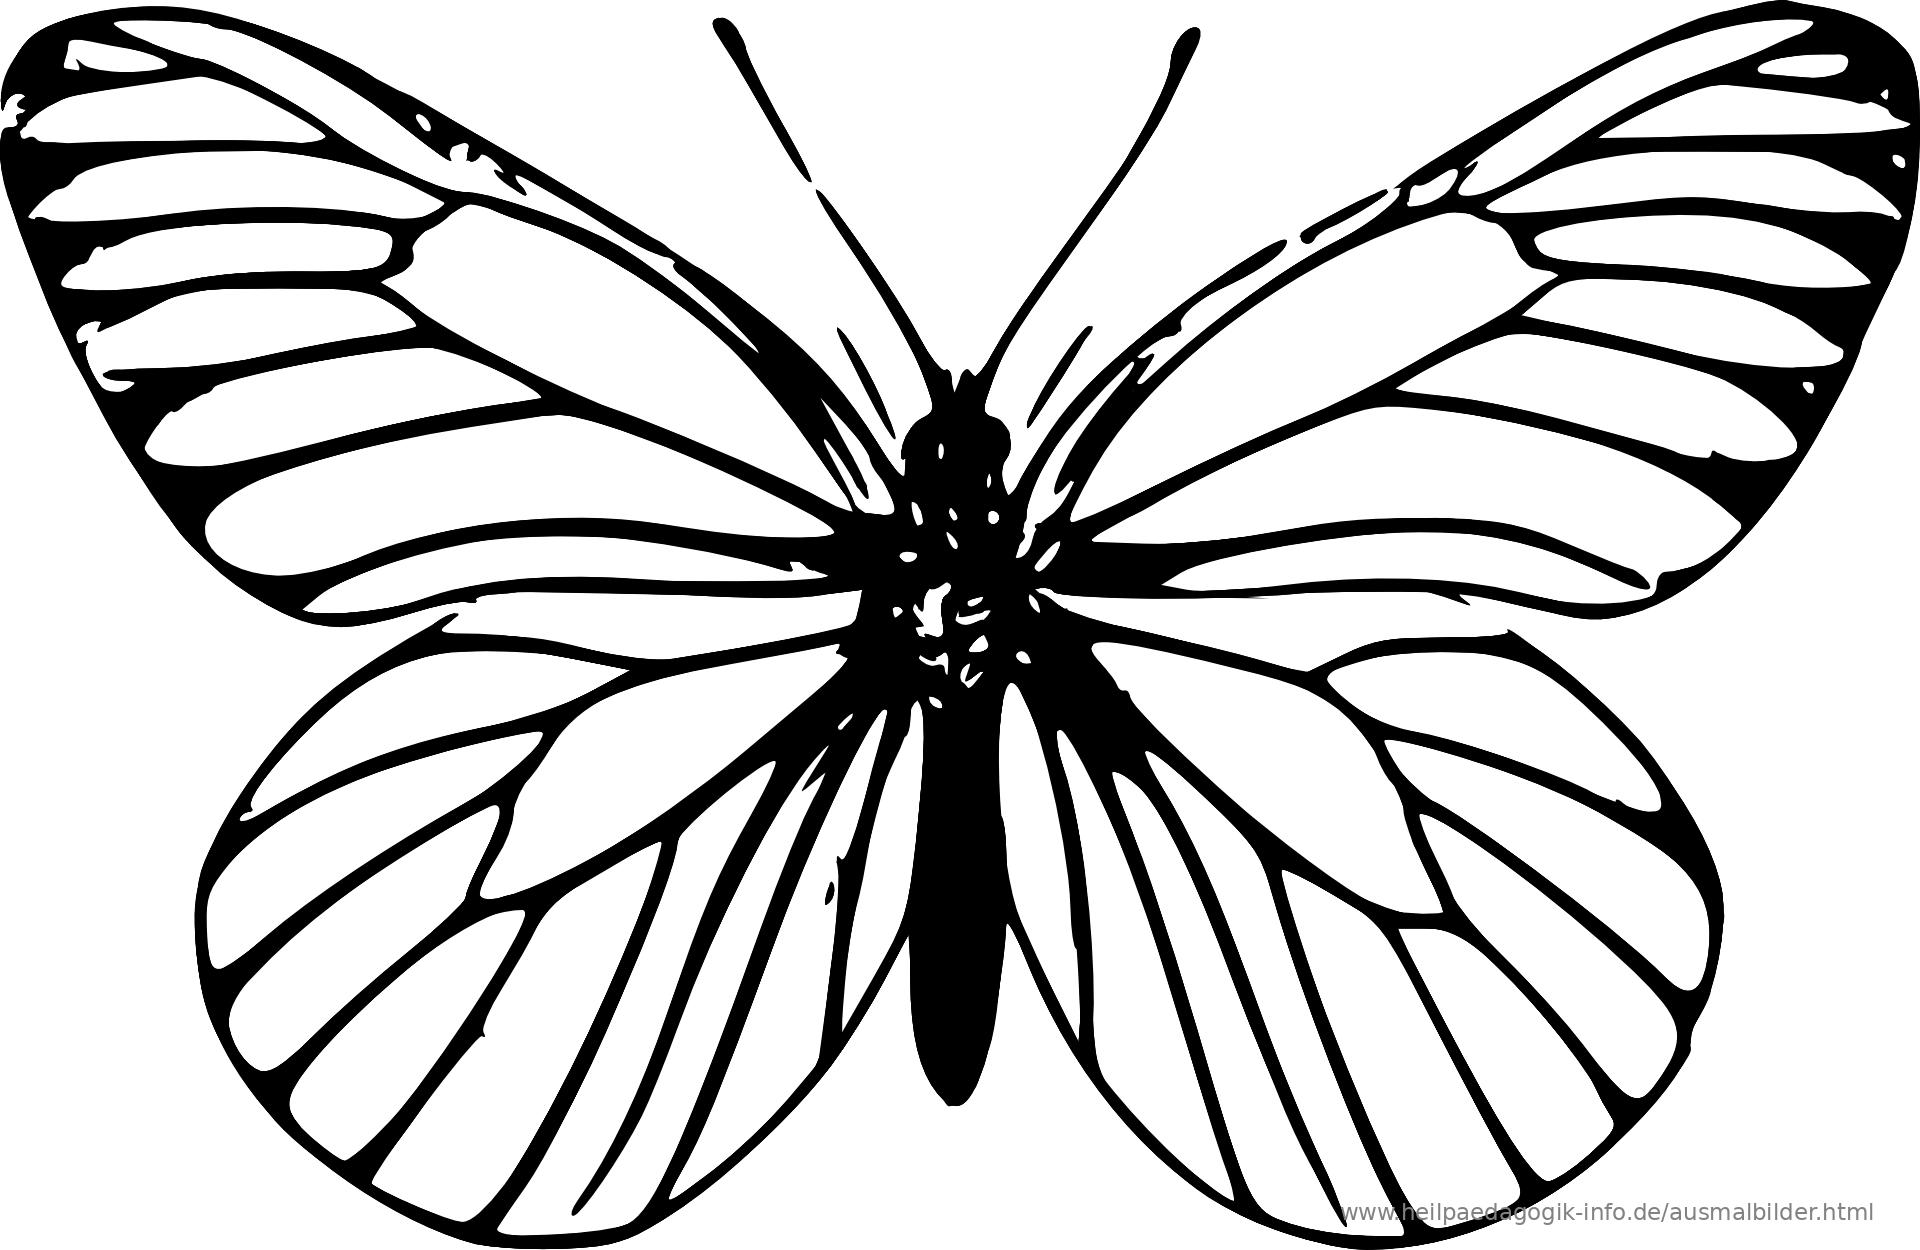 Ausmalbilder Käfer Schmetterlinge Insekten